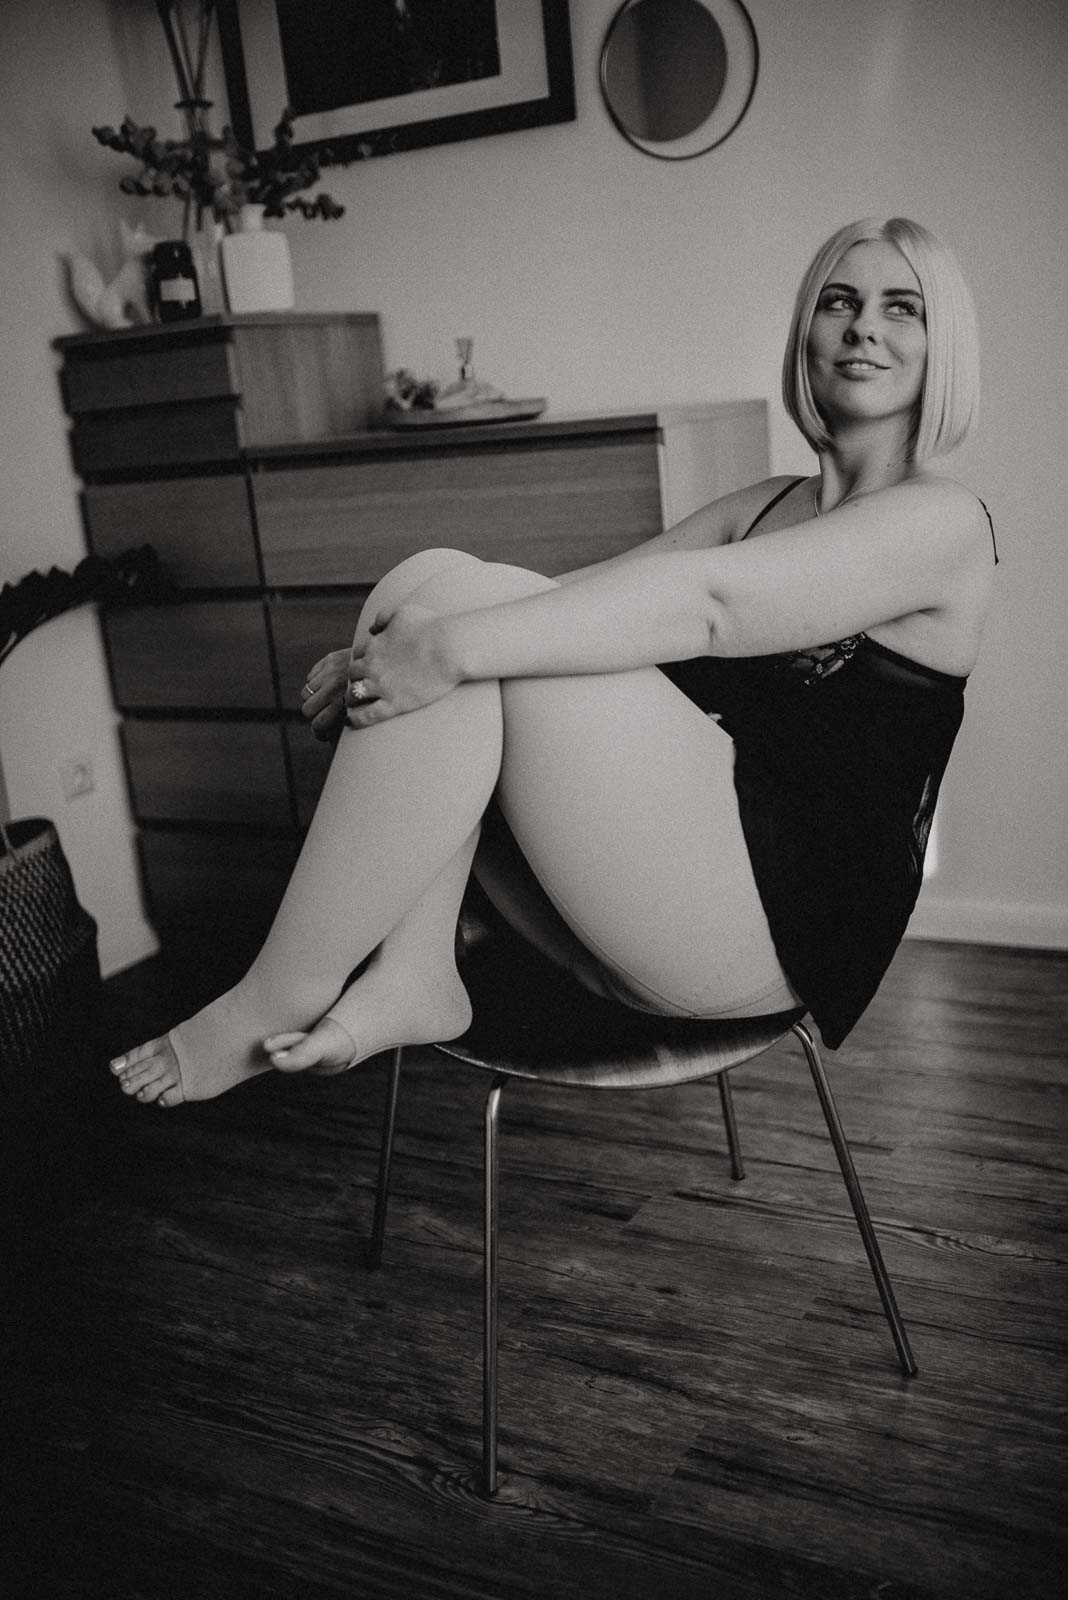 026-fotoshooting boudoir mit lipoedem als homeshooting_